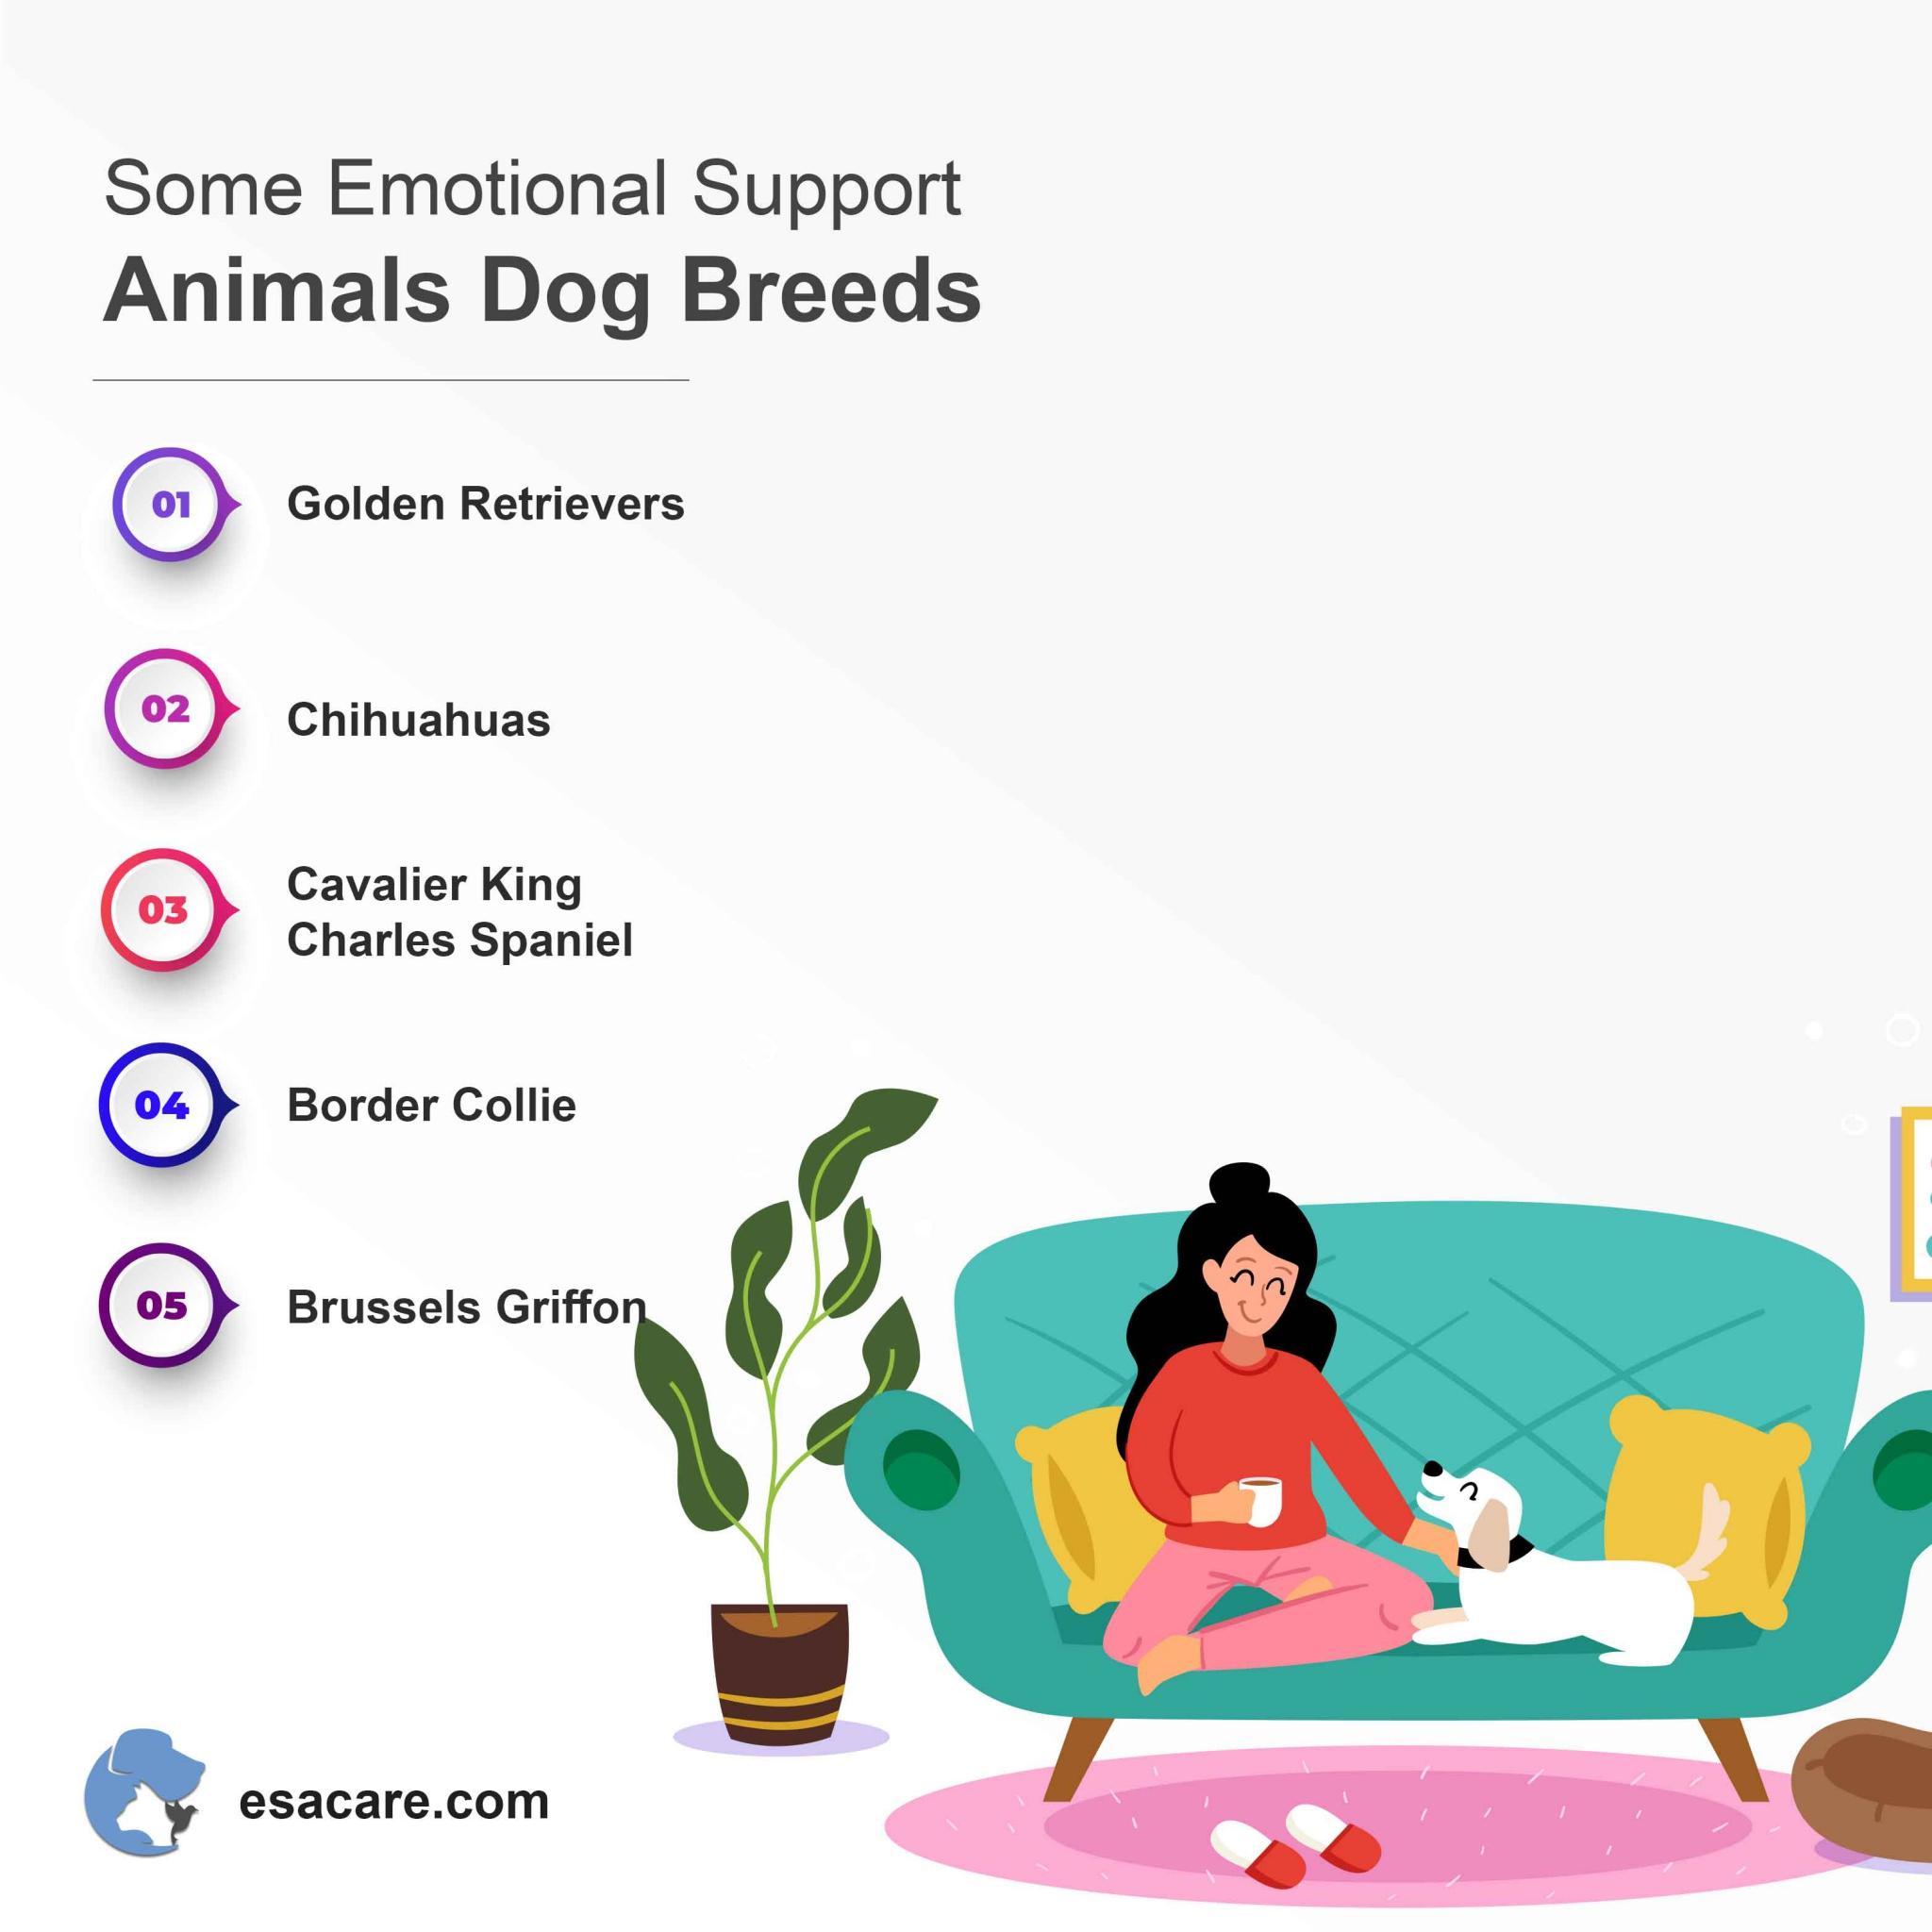 Emotional support animals dog breeds